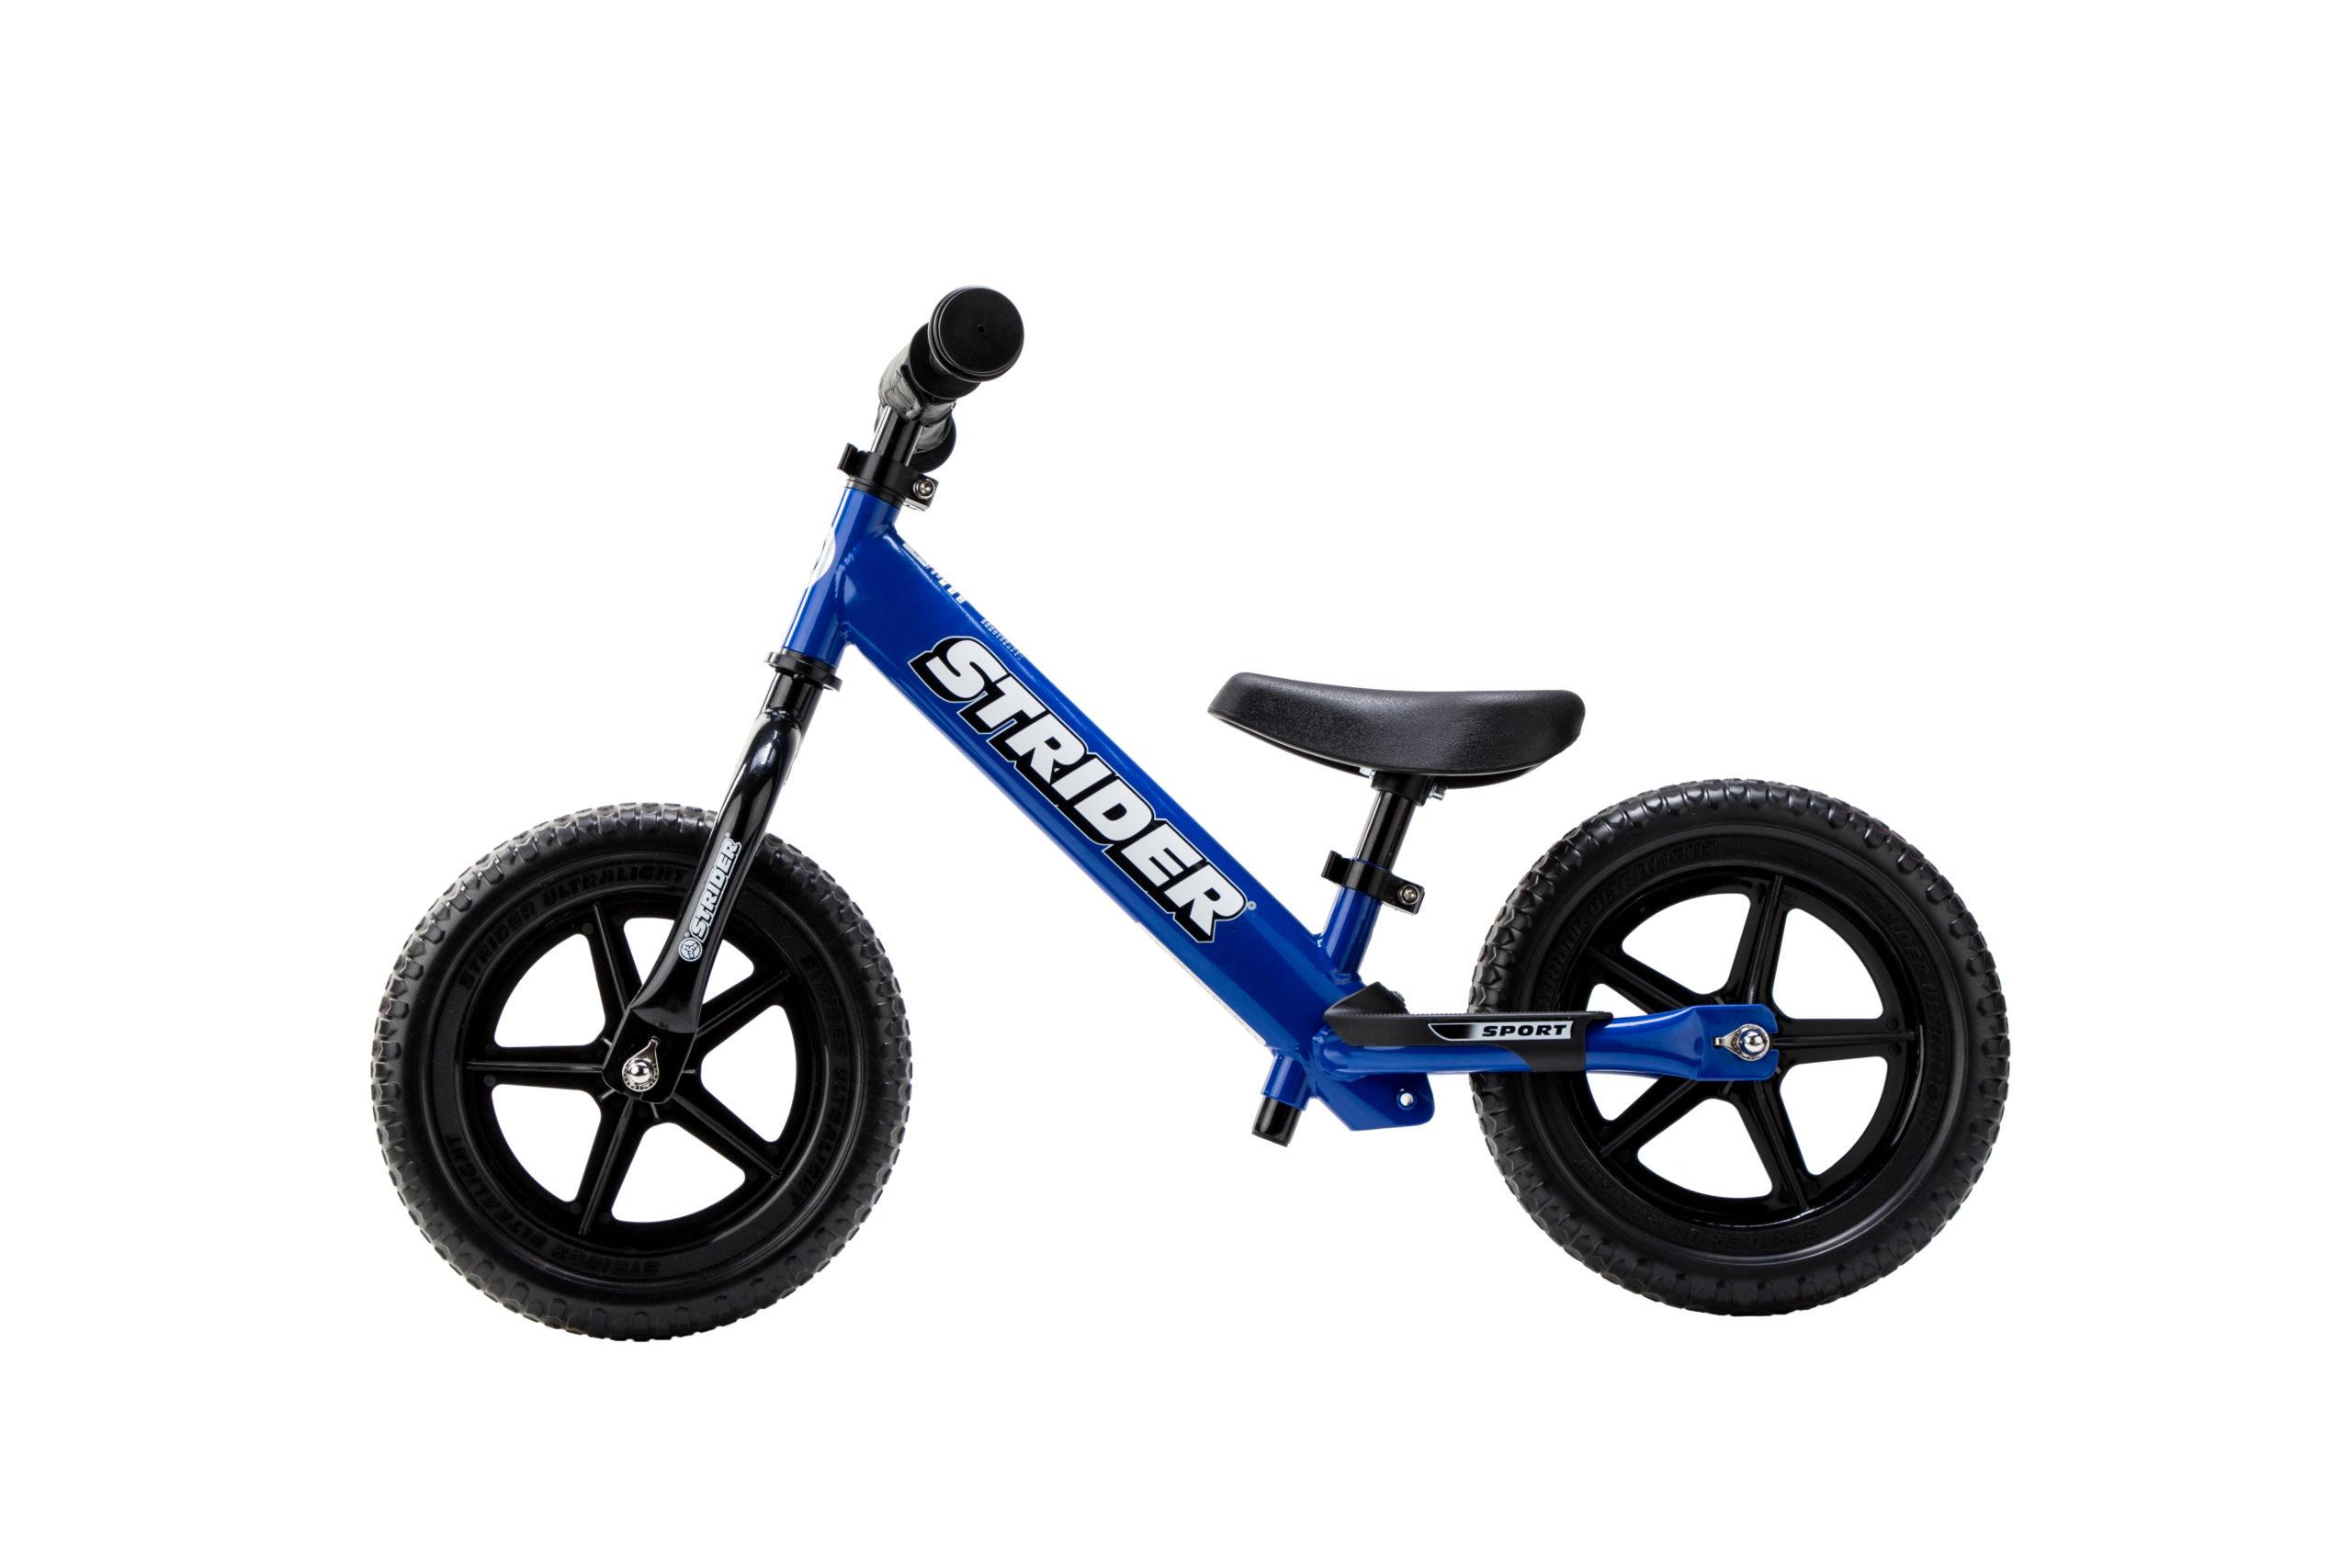 Studio image of Blue 12 Sport bike - side profile